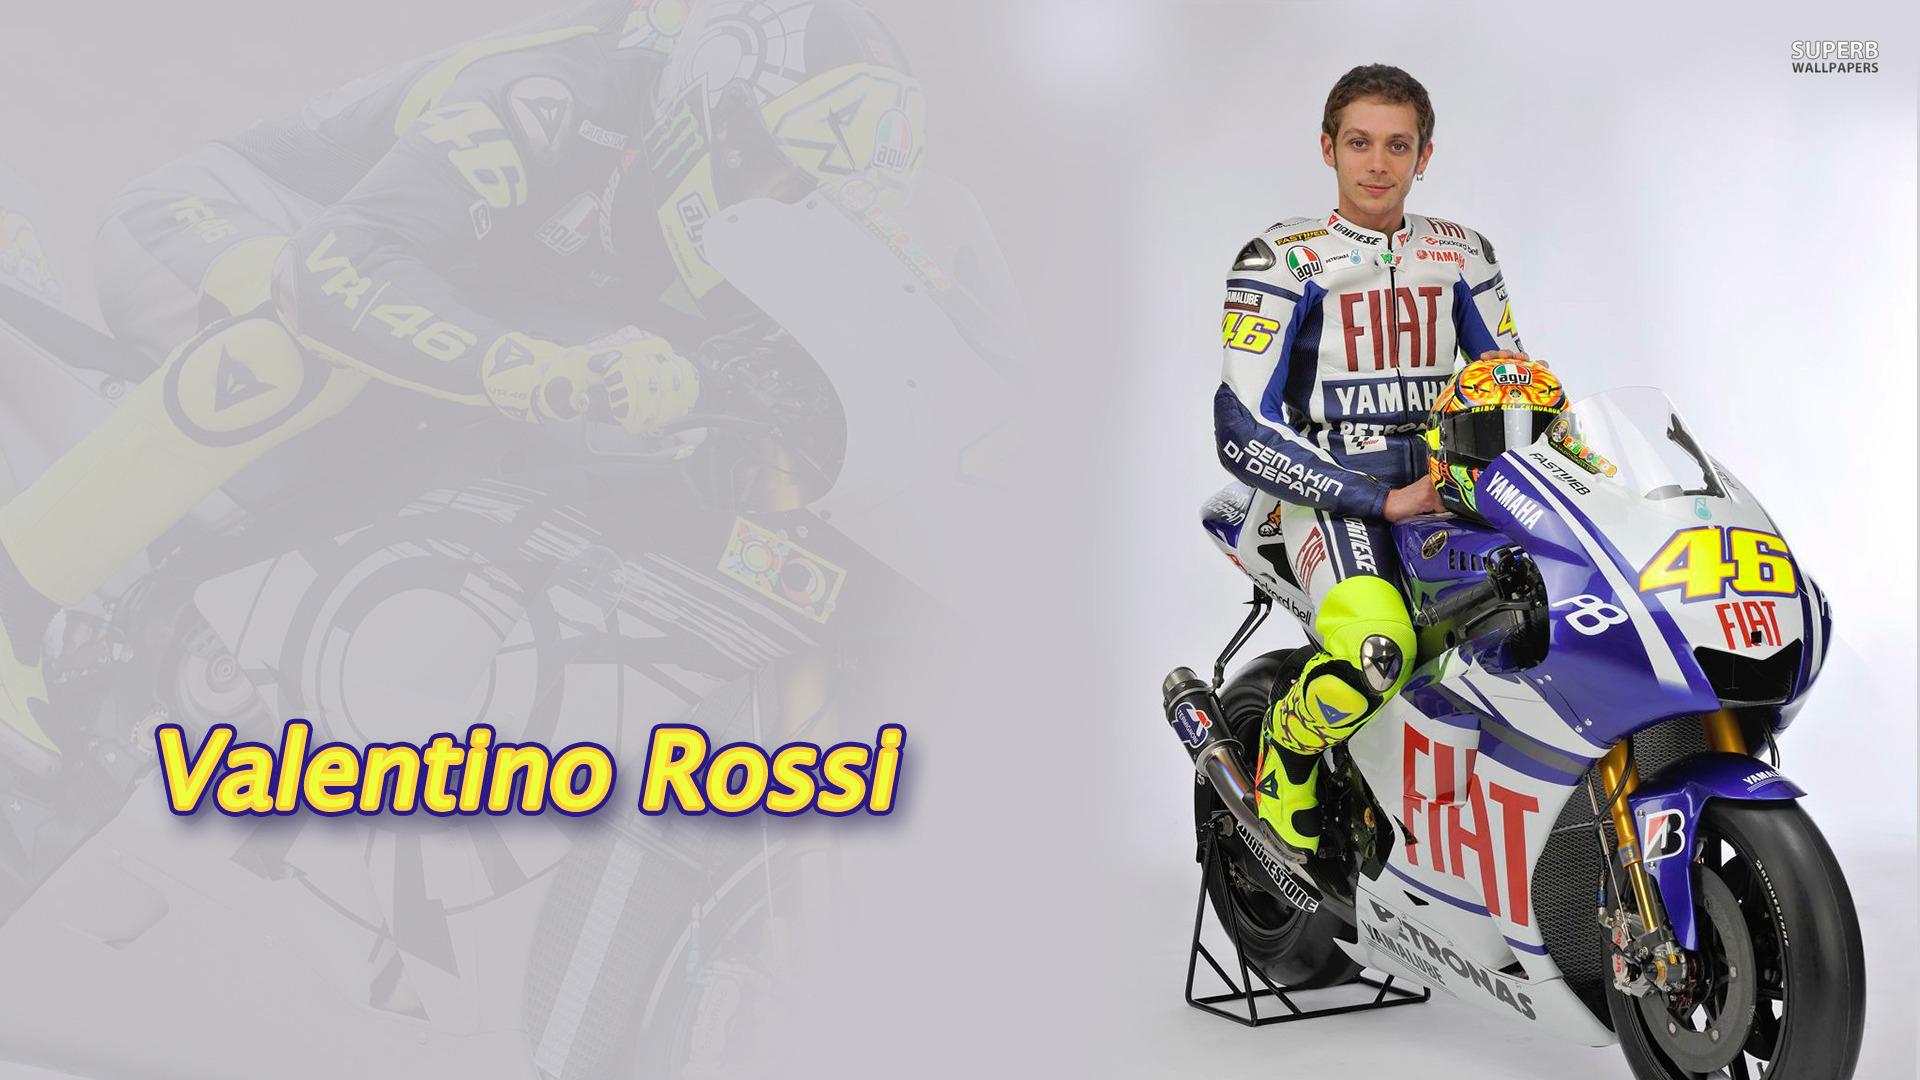 Valentino Rossi MotoGP Wallpapers Photos 1920x1080